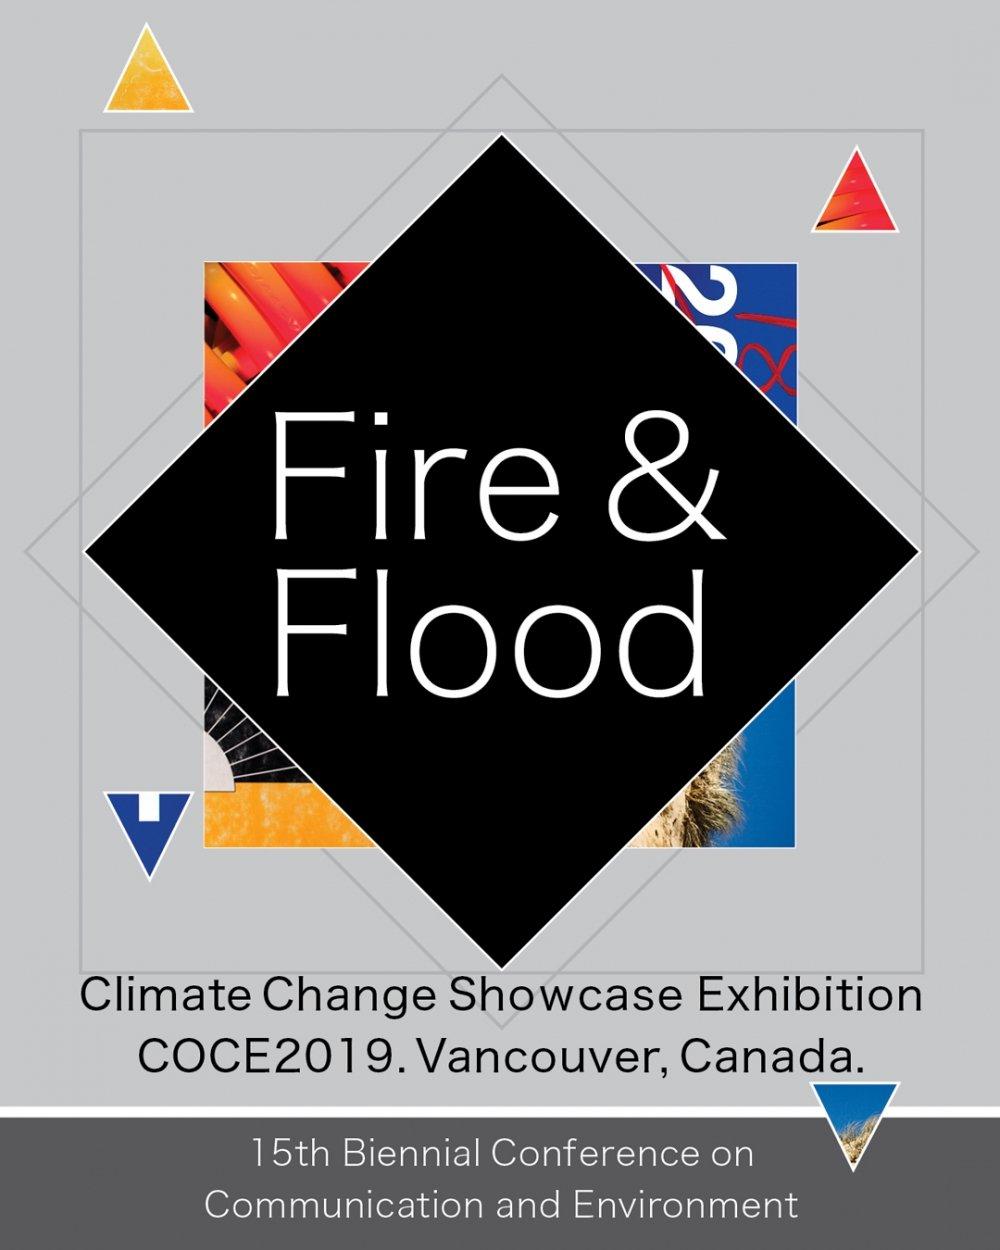 Fire & Flood logo